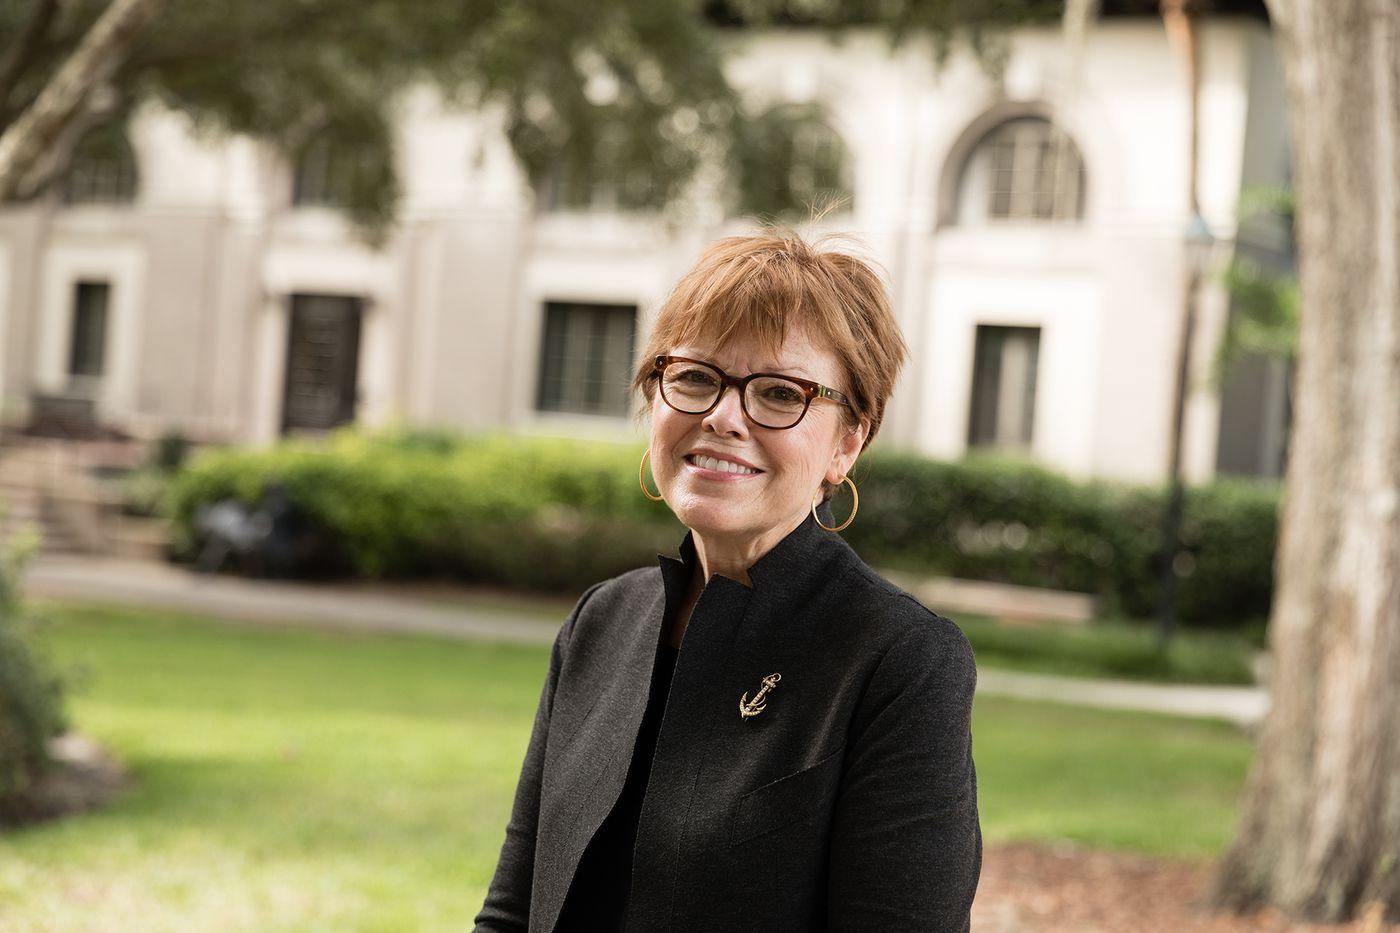 Rollins College Board of Trustee Susan Whealler Johnston '75